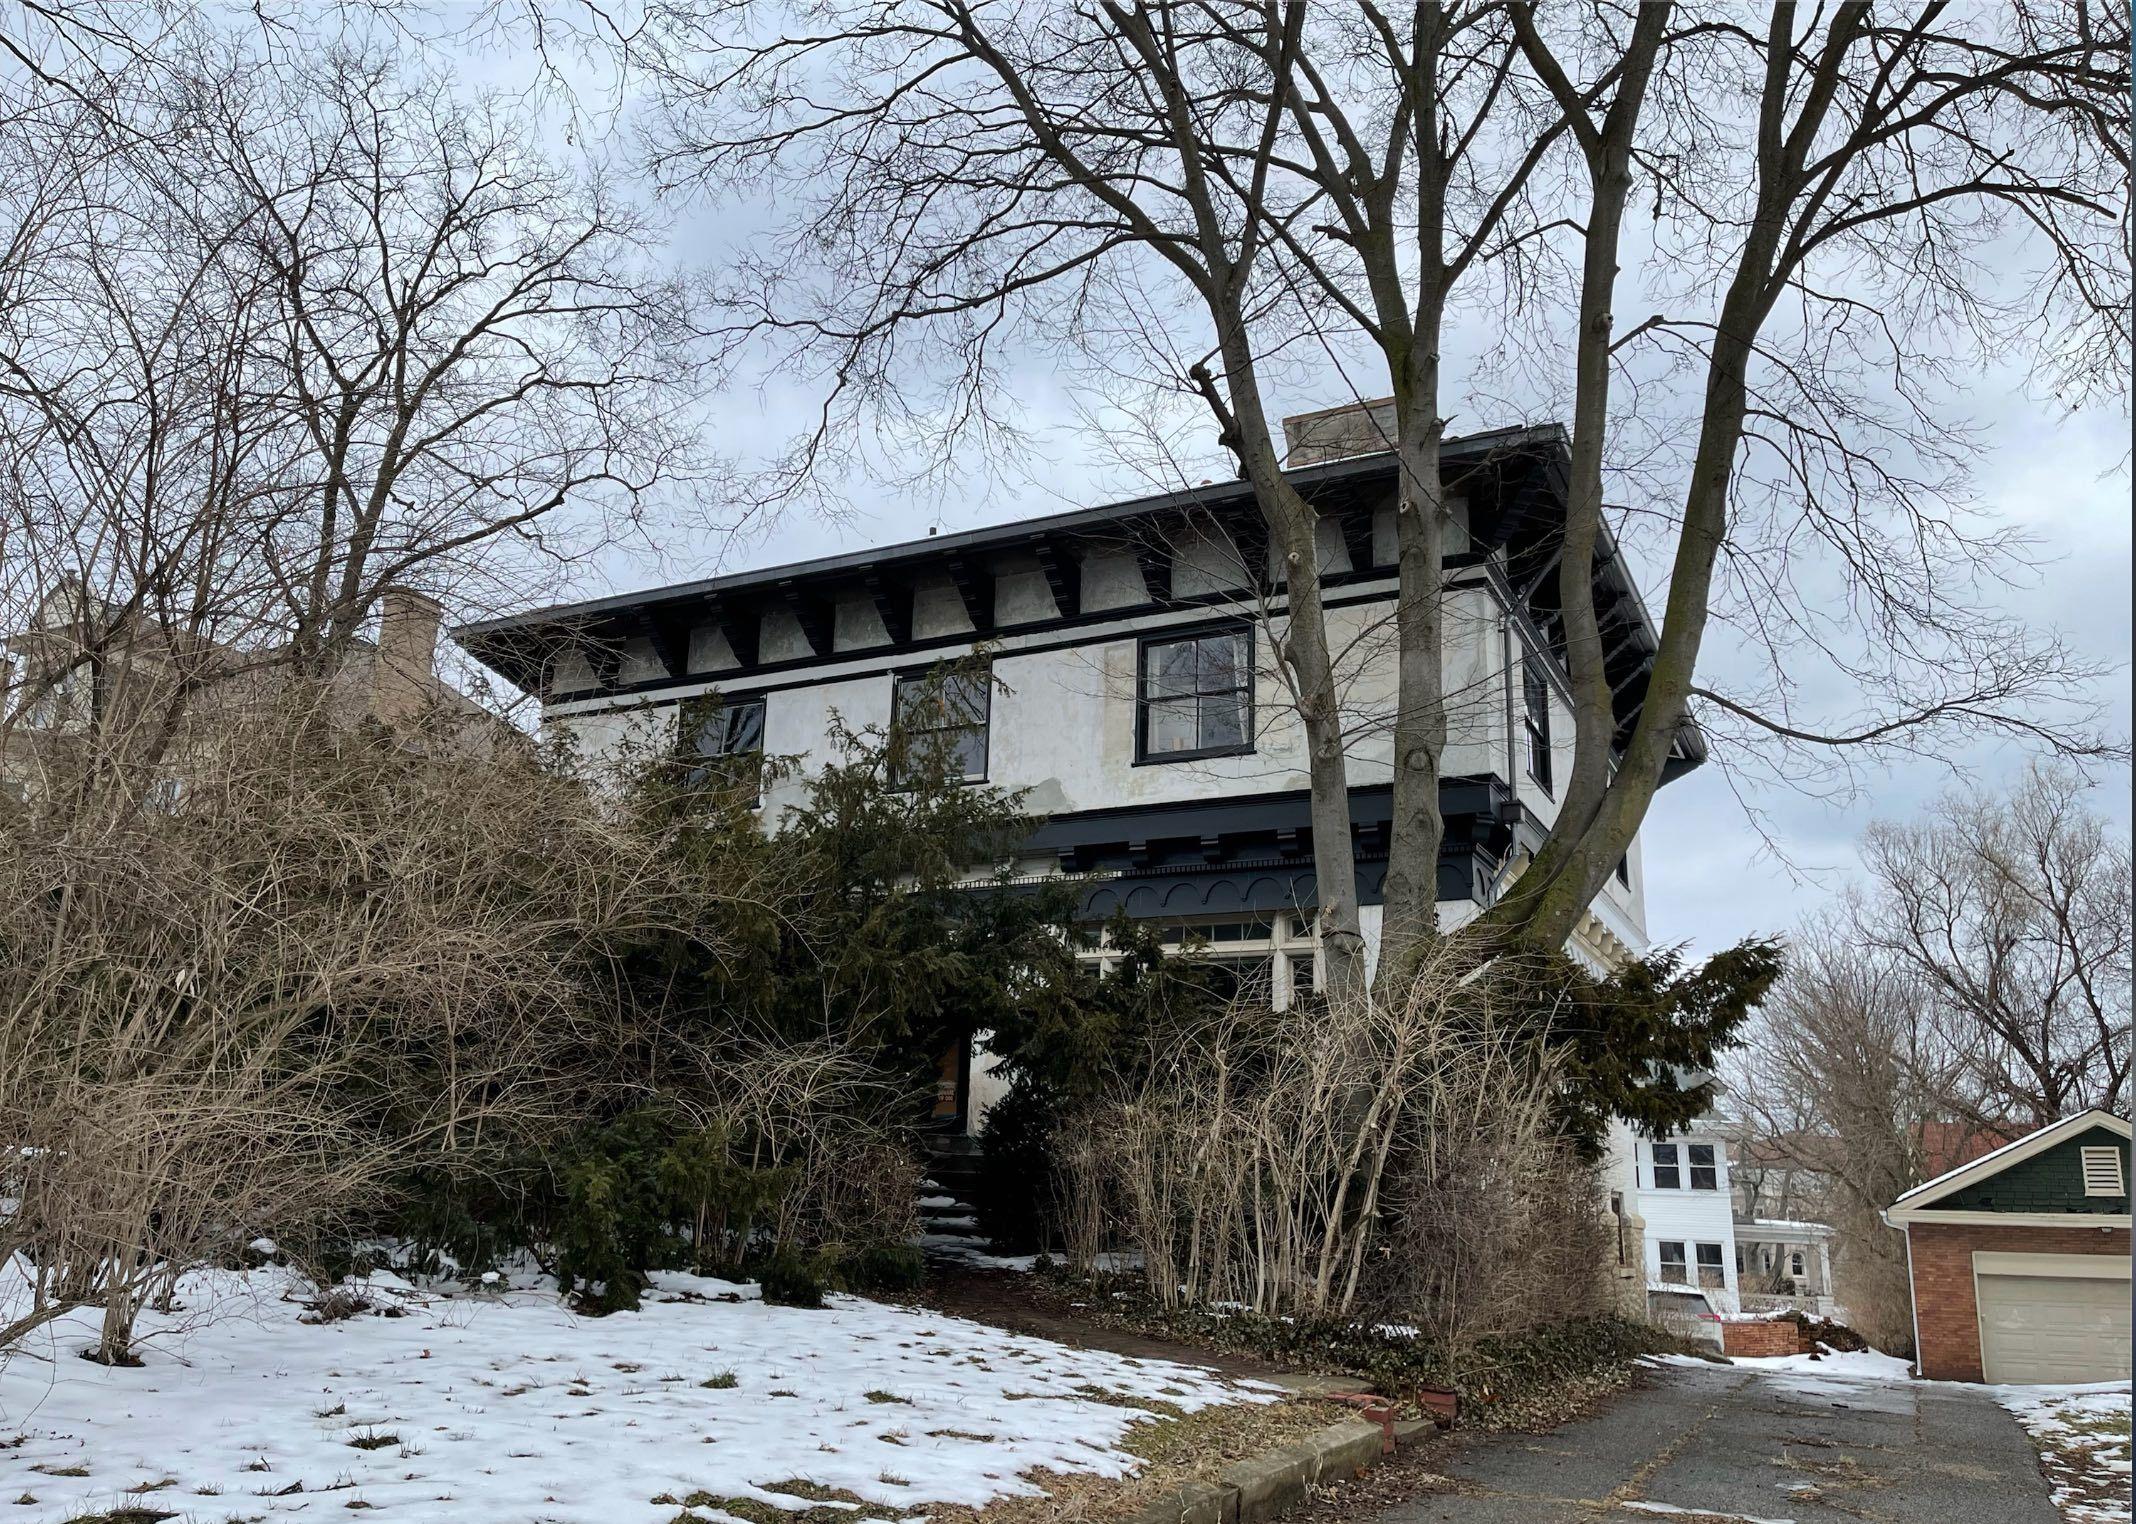 986 Dana Ave (Image - 1)